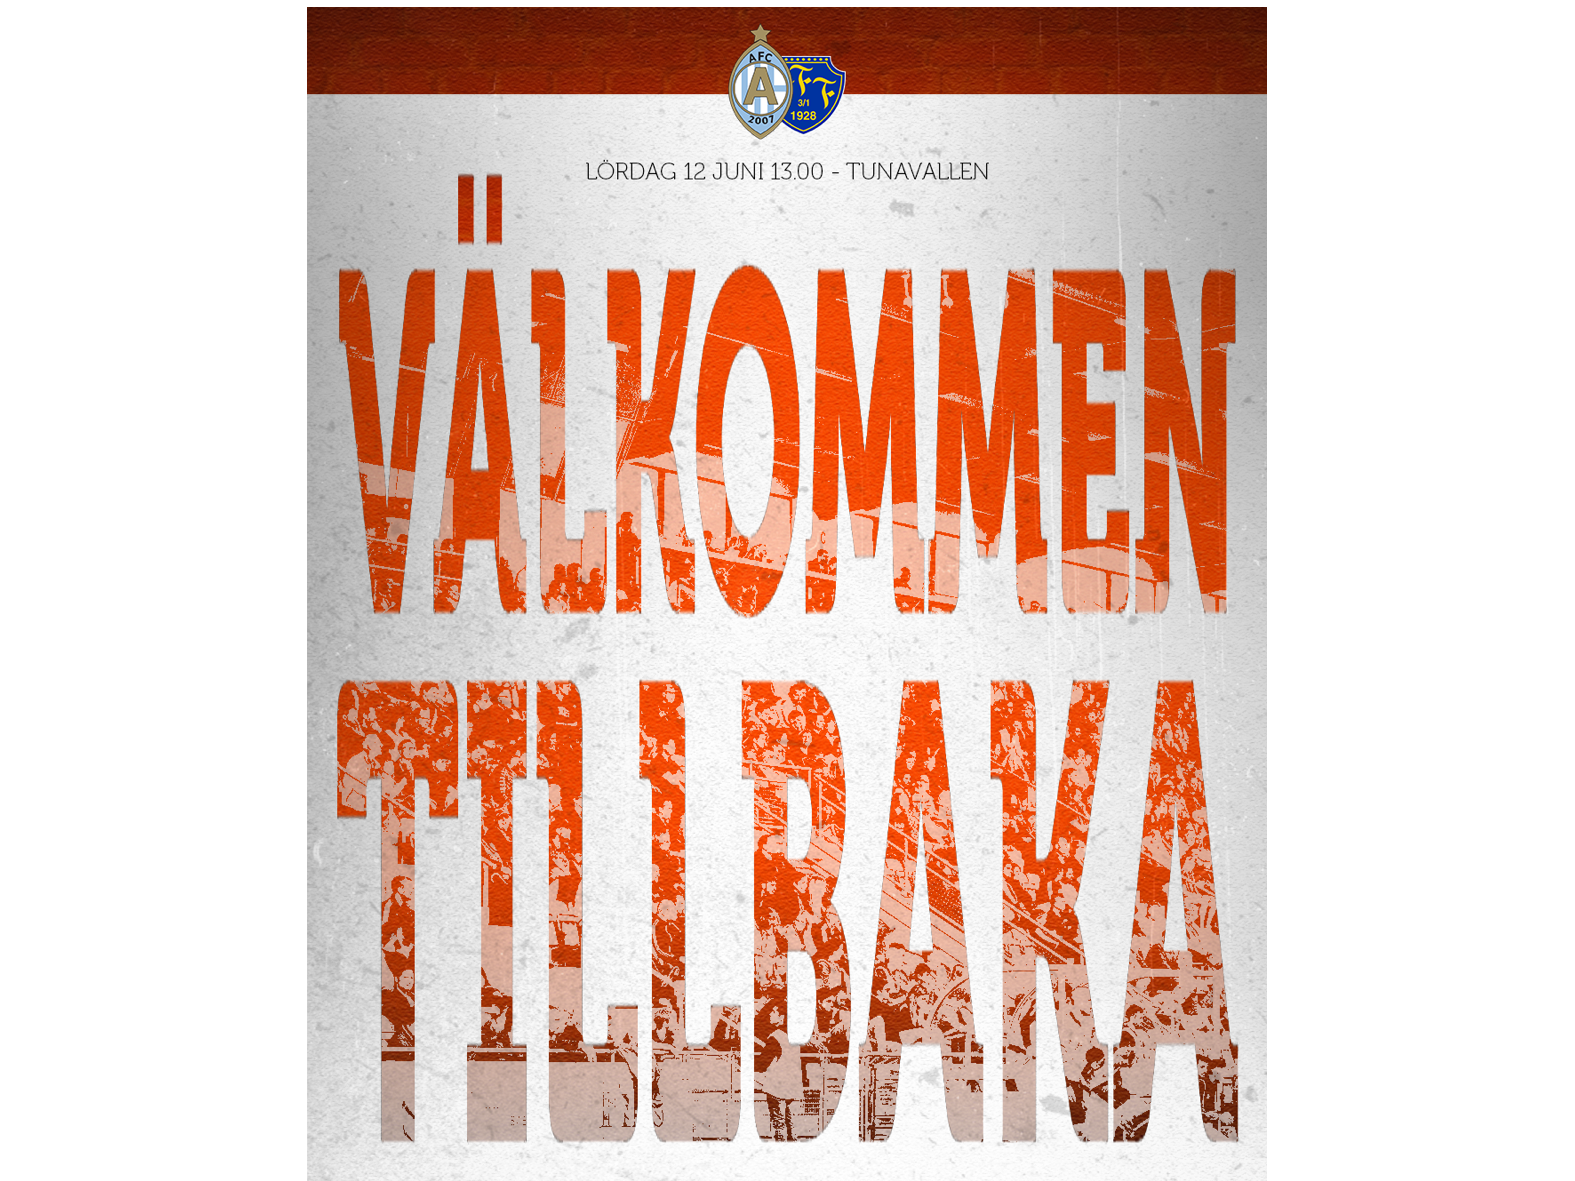 Biljetter till AFC Eskilstuna - Falkenbergs FF lör 12 juni kl. 13.00